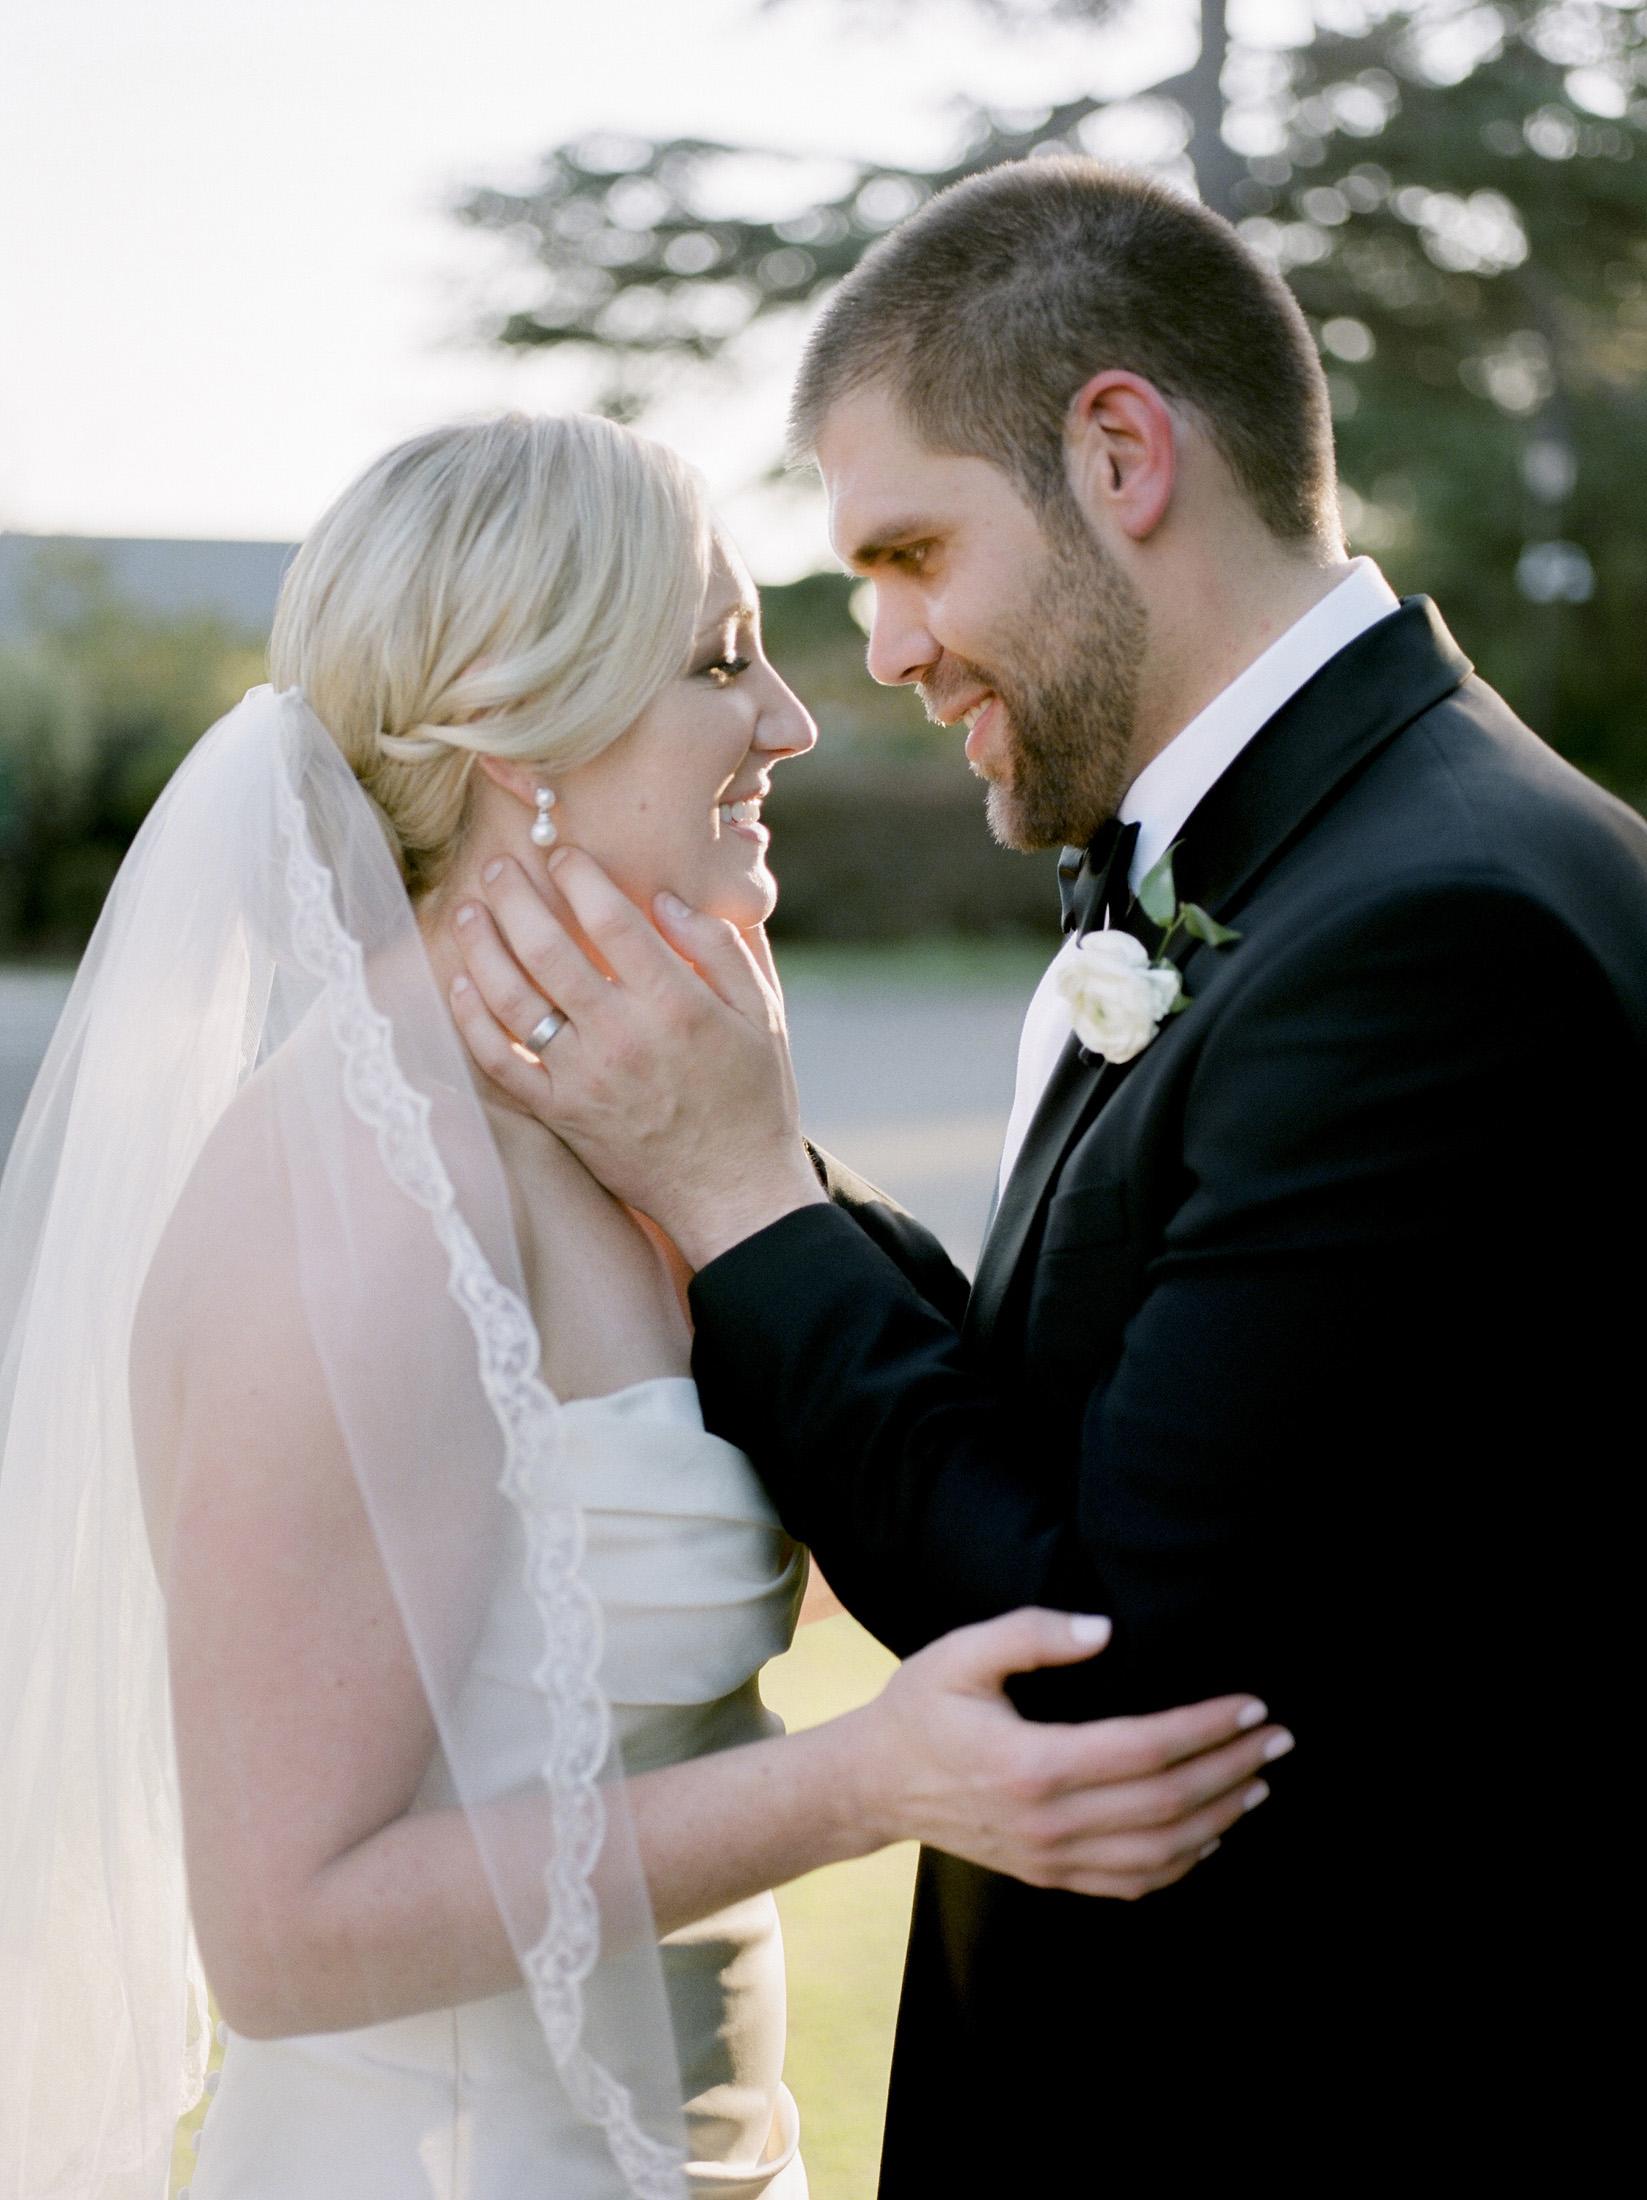 Romantin wedding photographer in san francisco